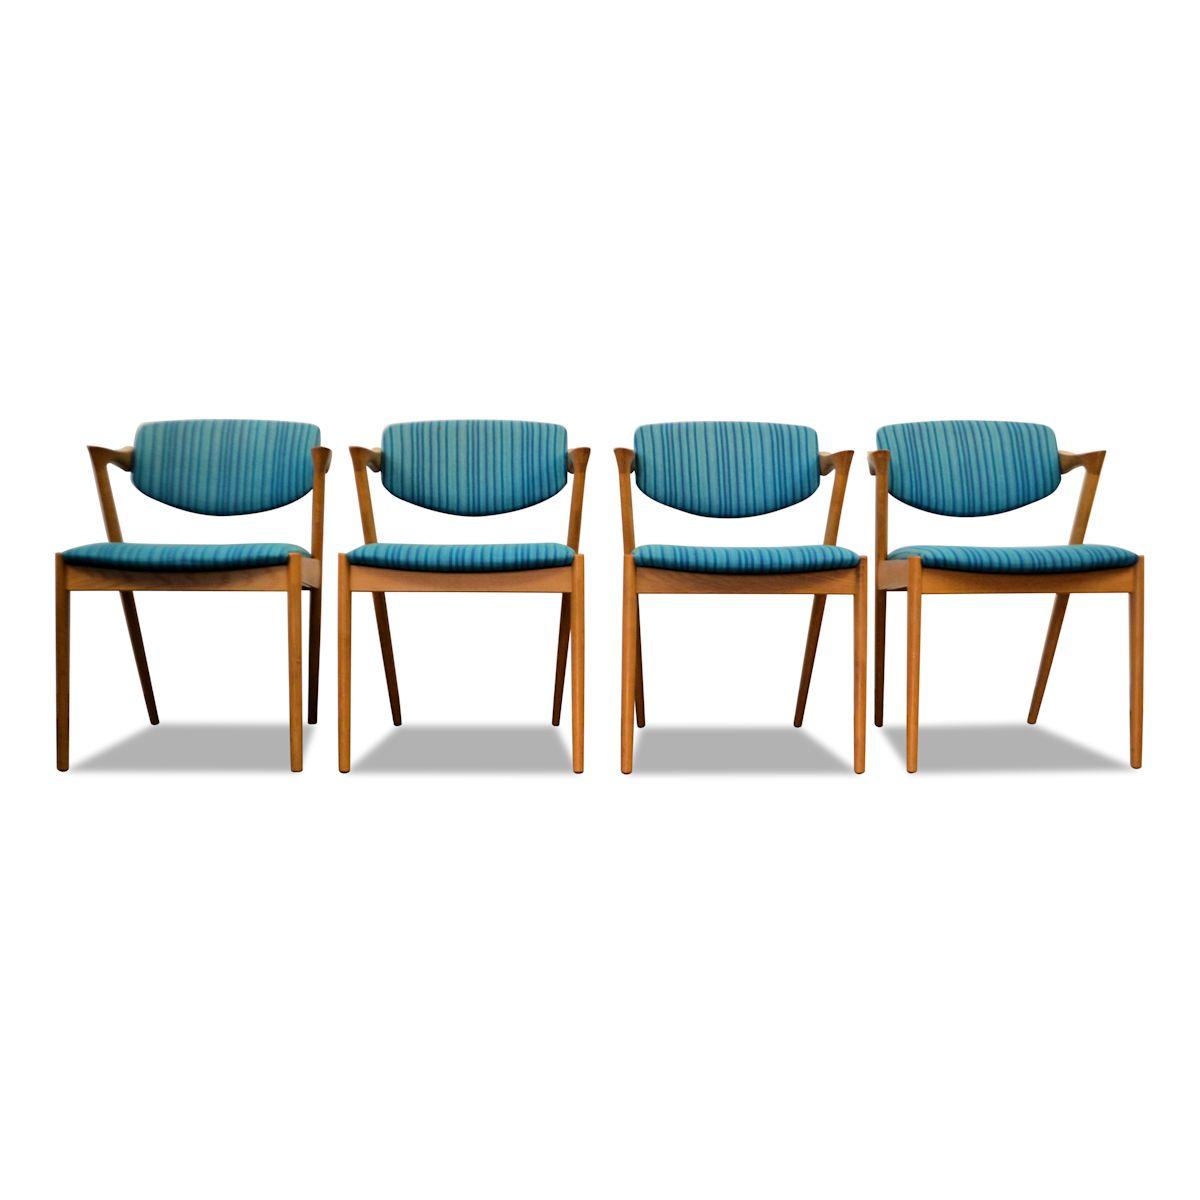 Vintage Kai Kristiansen Model #42 Dining Chairs